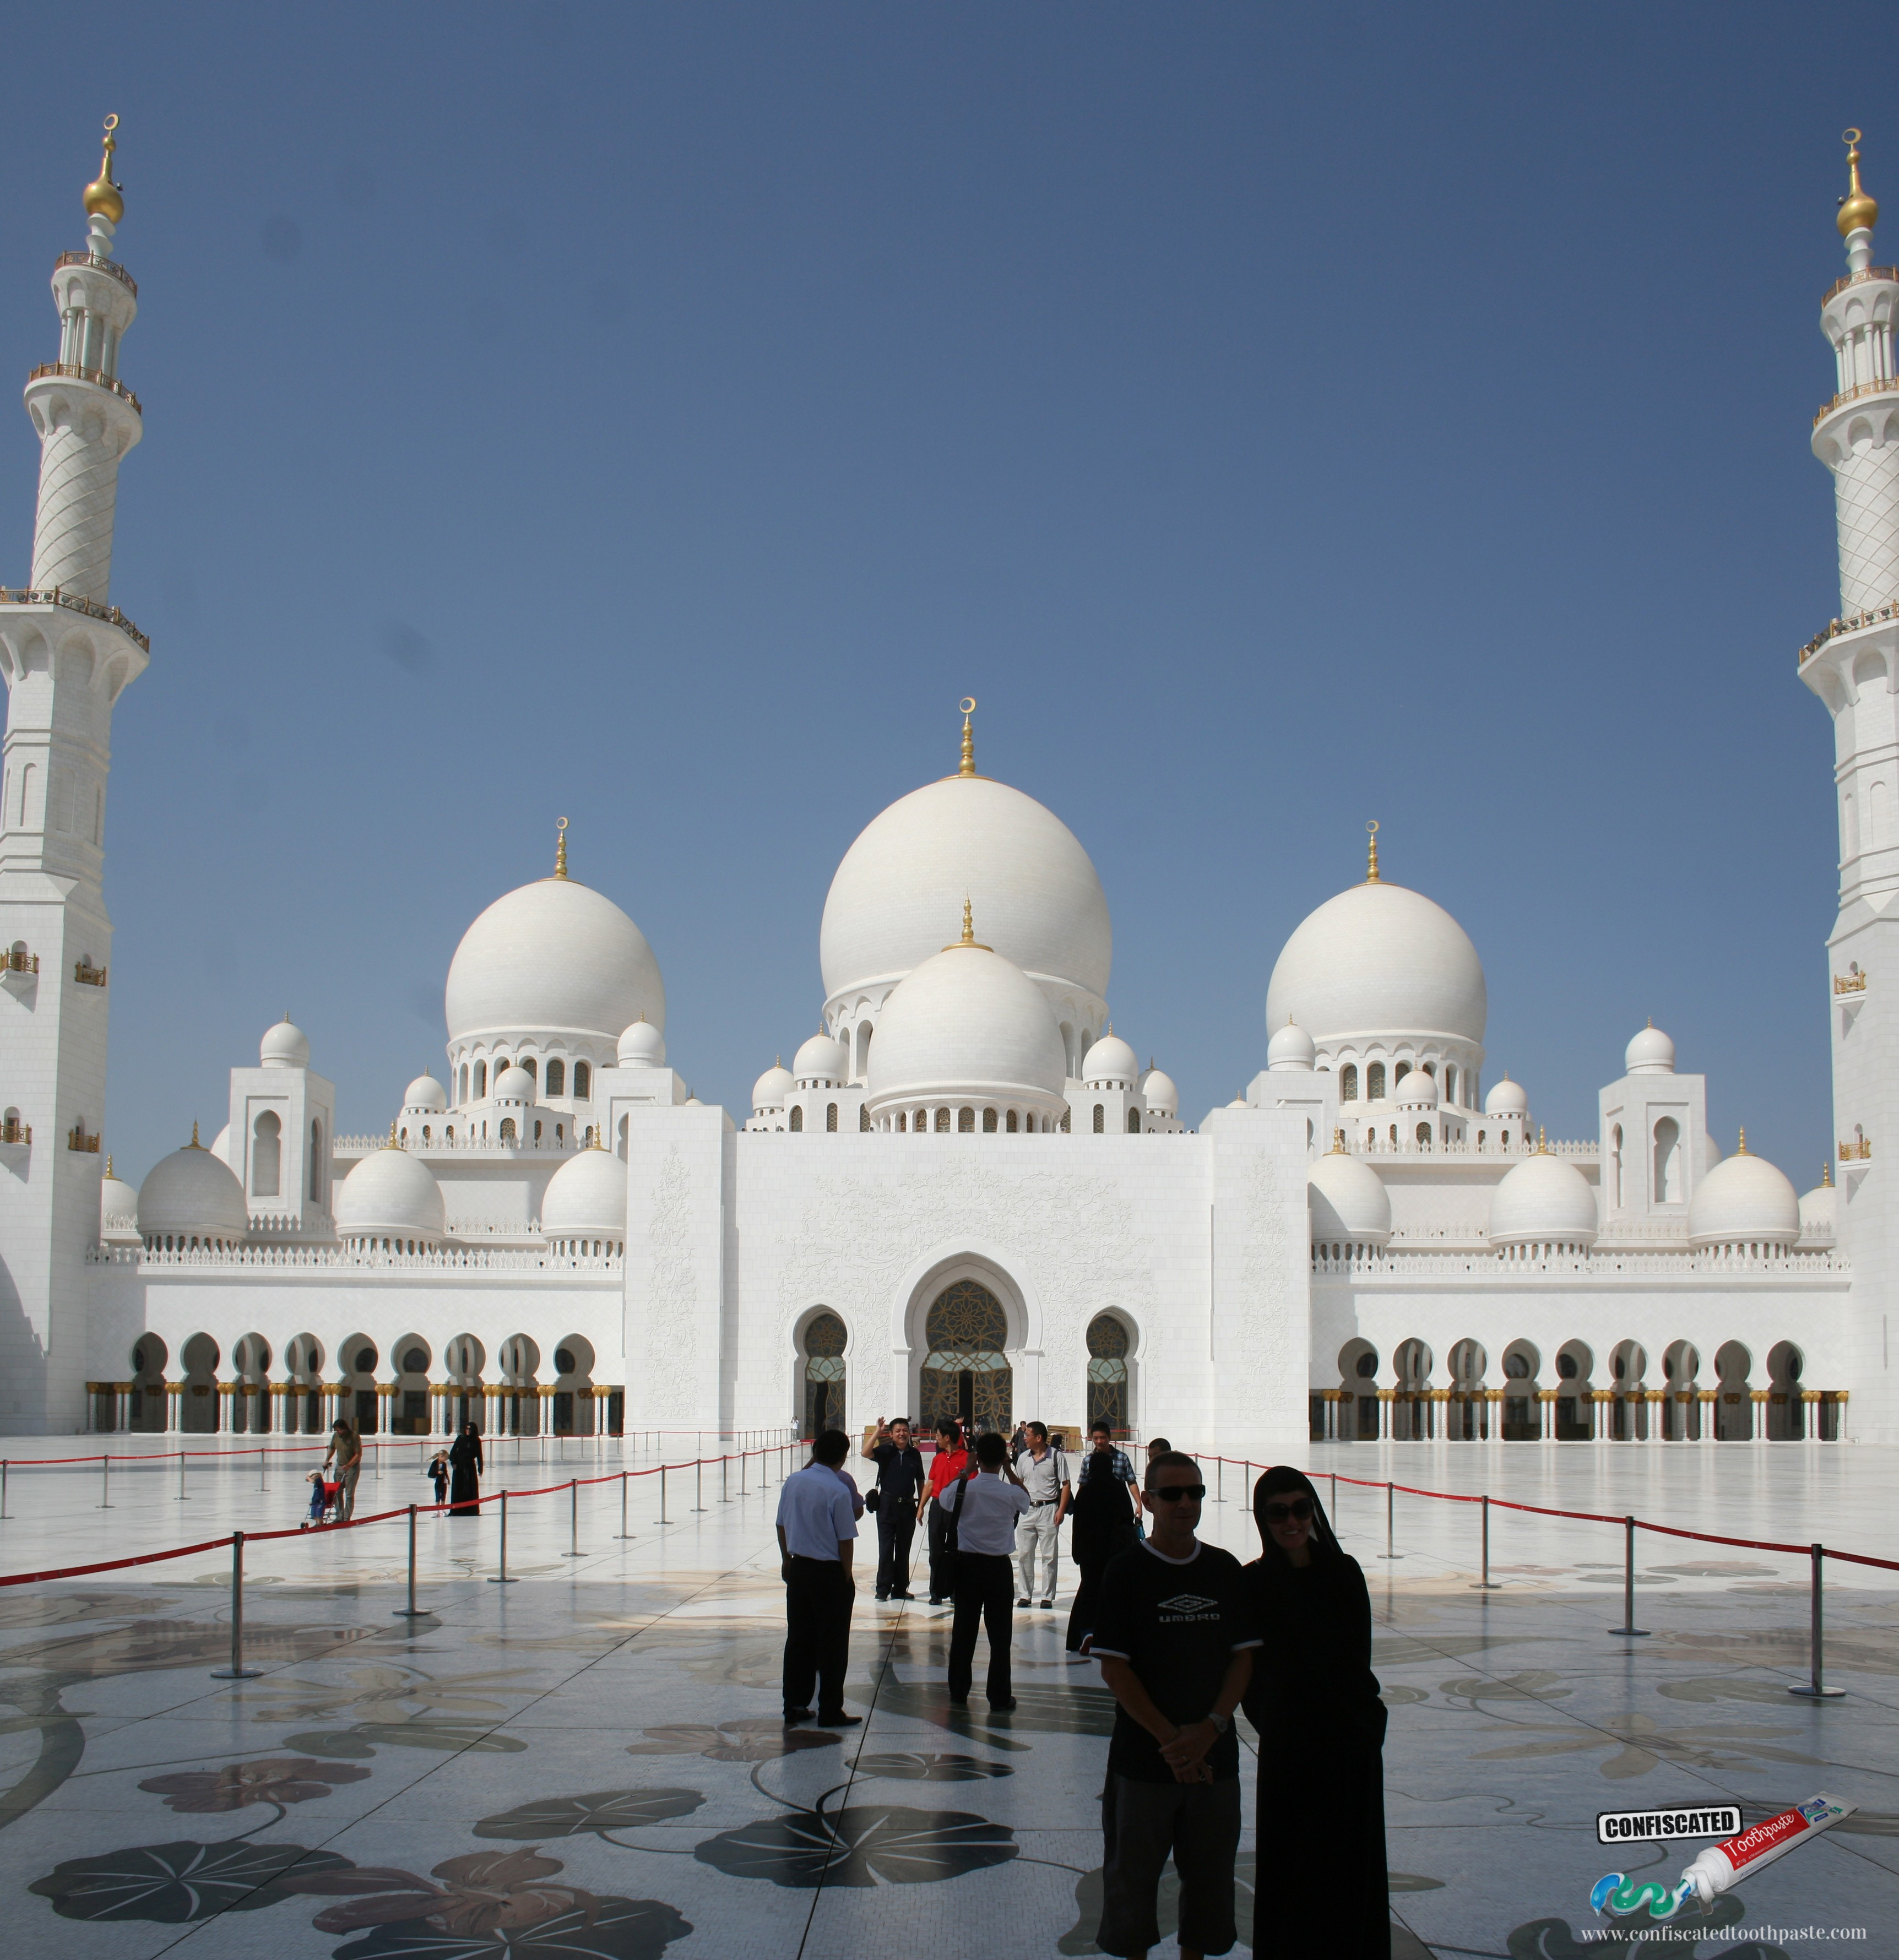 The incredible Sheikh Zayed Mosque in Abu Dhabi, UAE